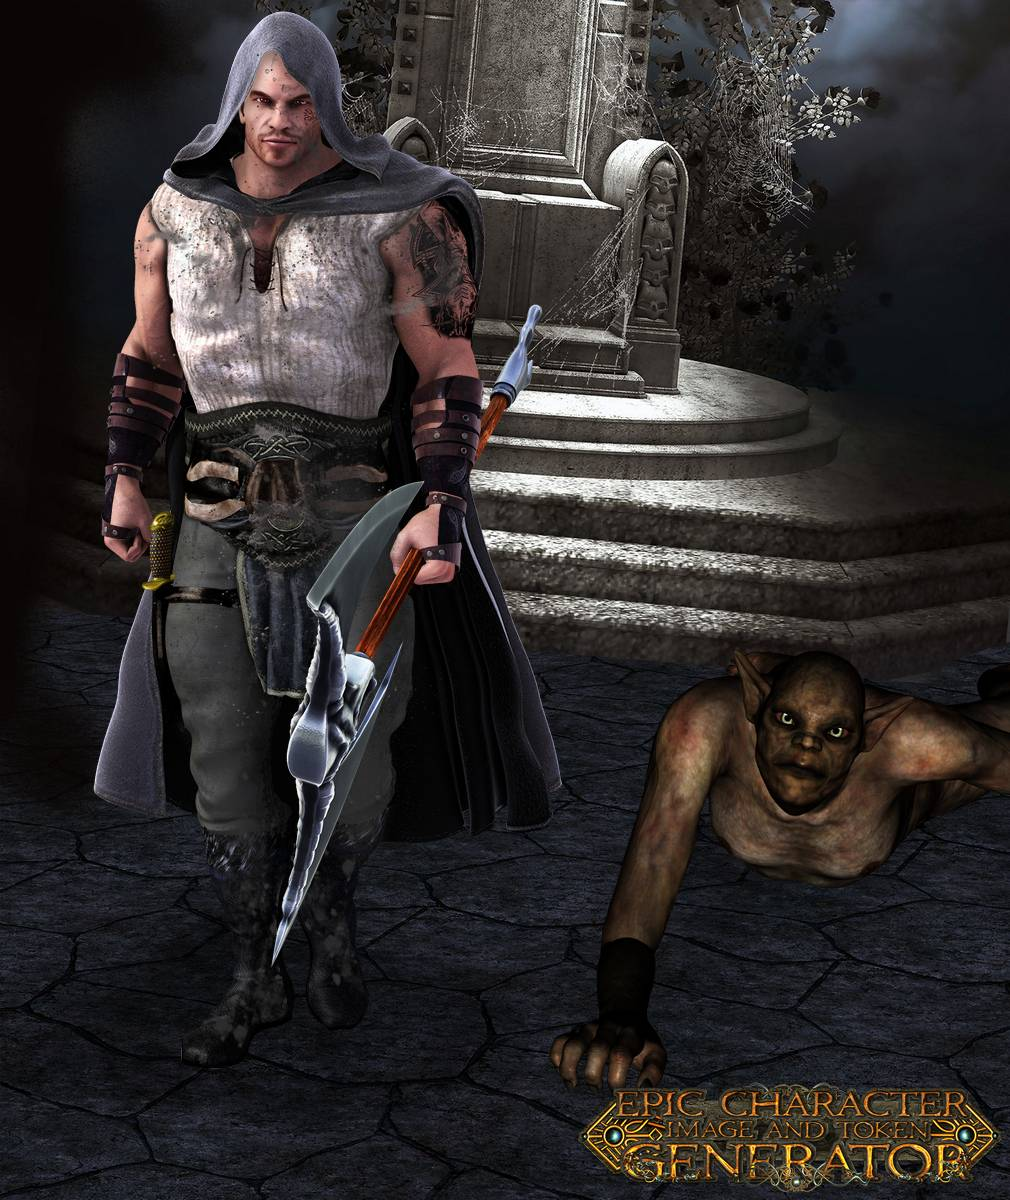 ePic Character Generator Season 2 Muscular Barbarian Screenshot 02